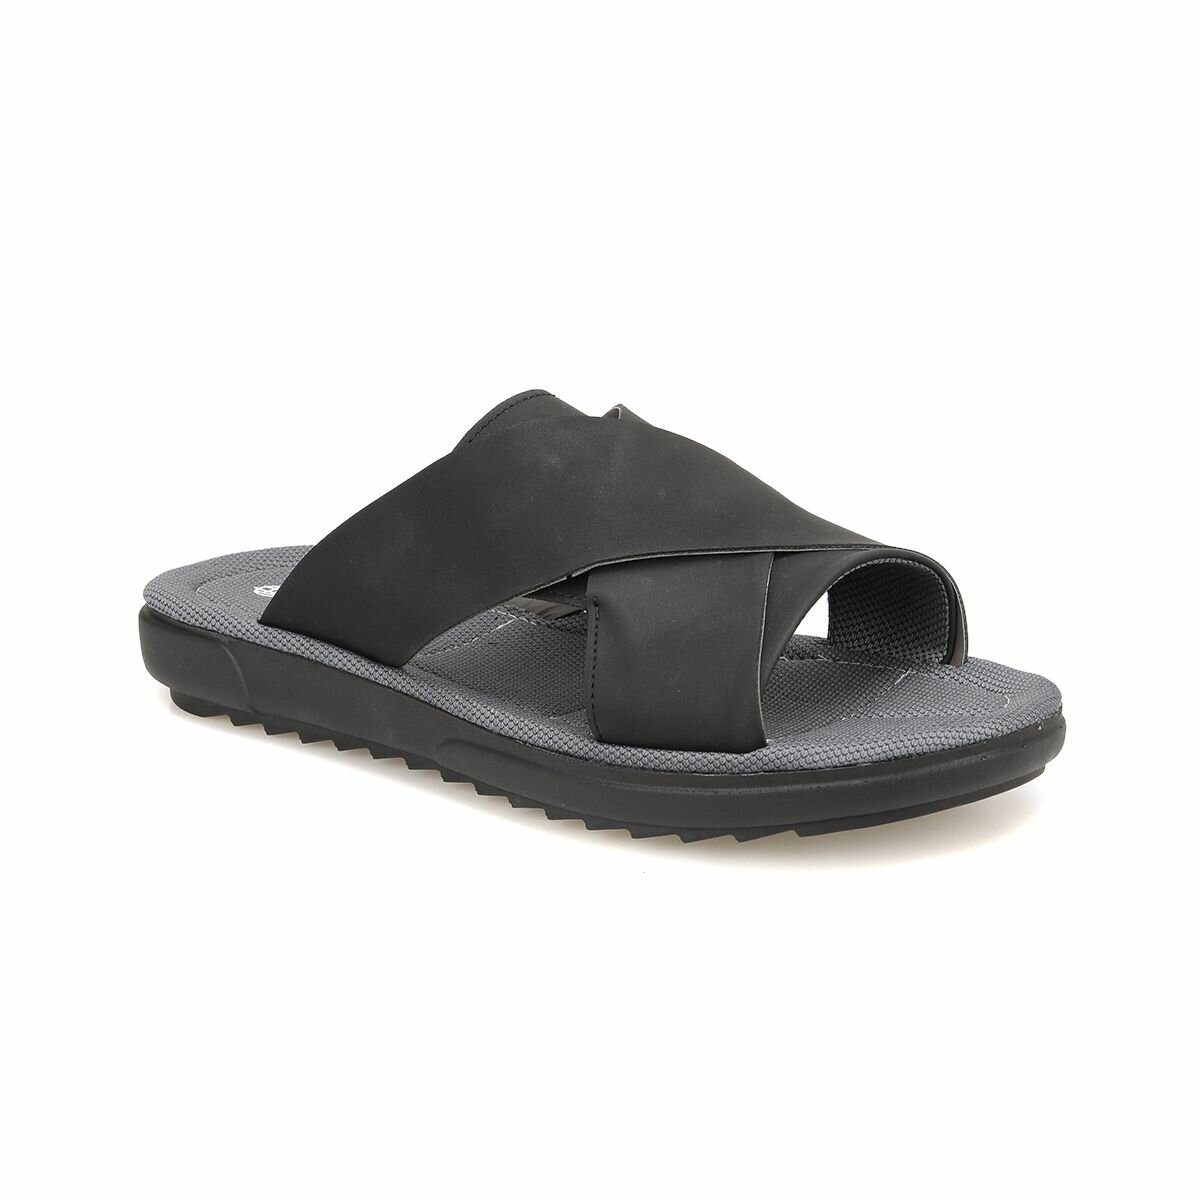 FLO CMPR-2 Black Male Sandals Panama Club